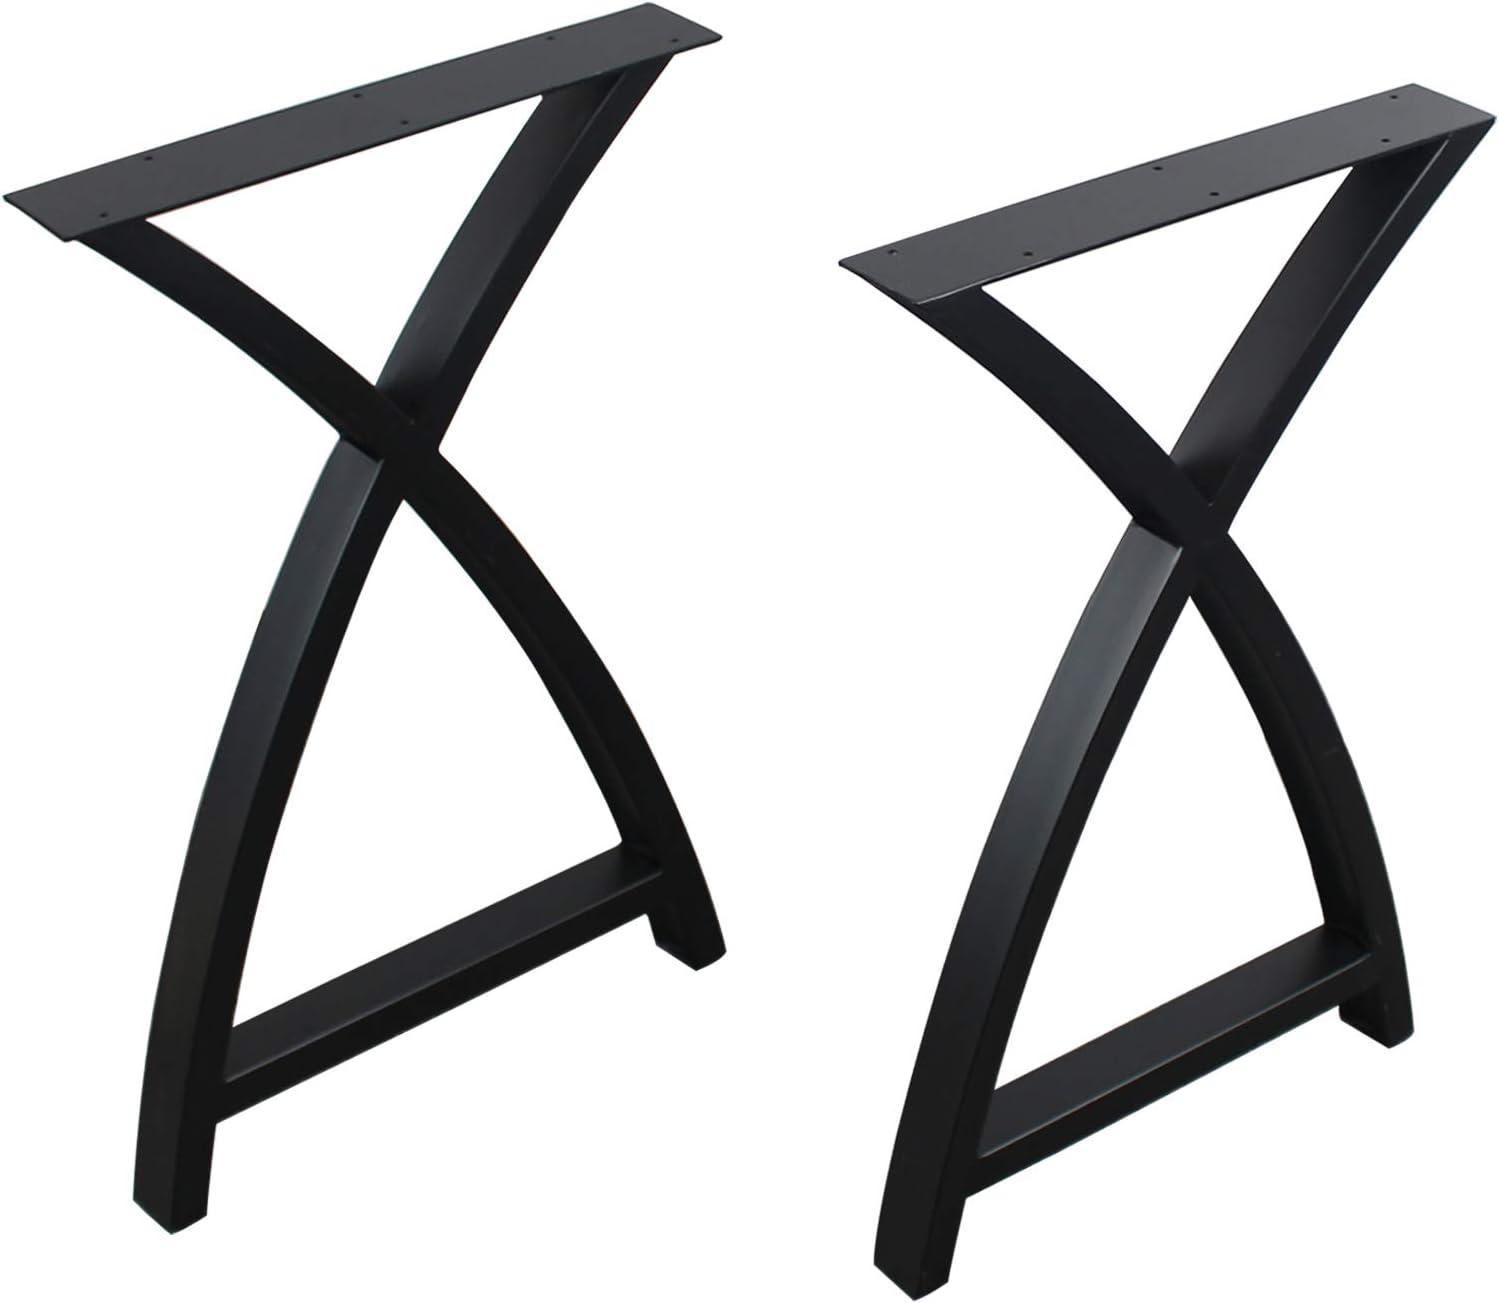 MBQQ 2 Pcs Furniture Legs Rustic Decory Arc Triangle supreme Table Daily bargain sale Shape